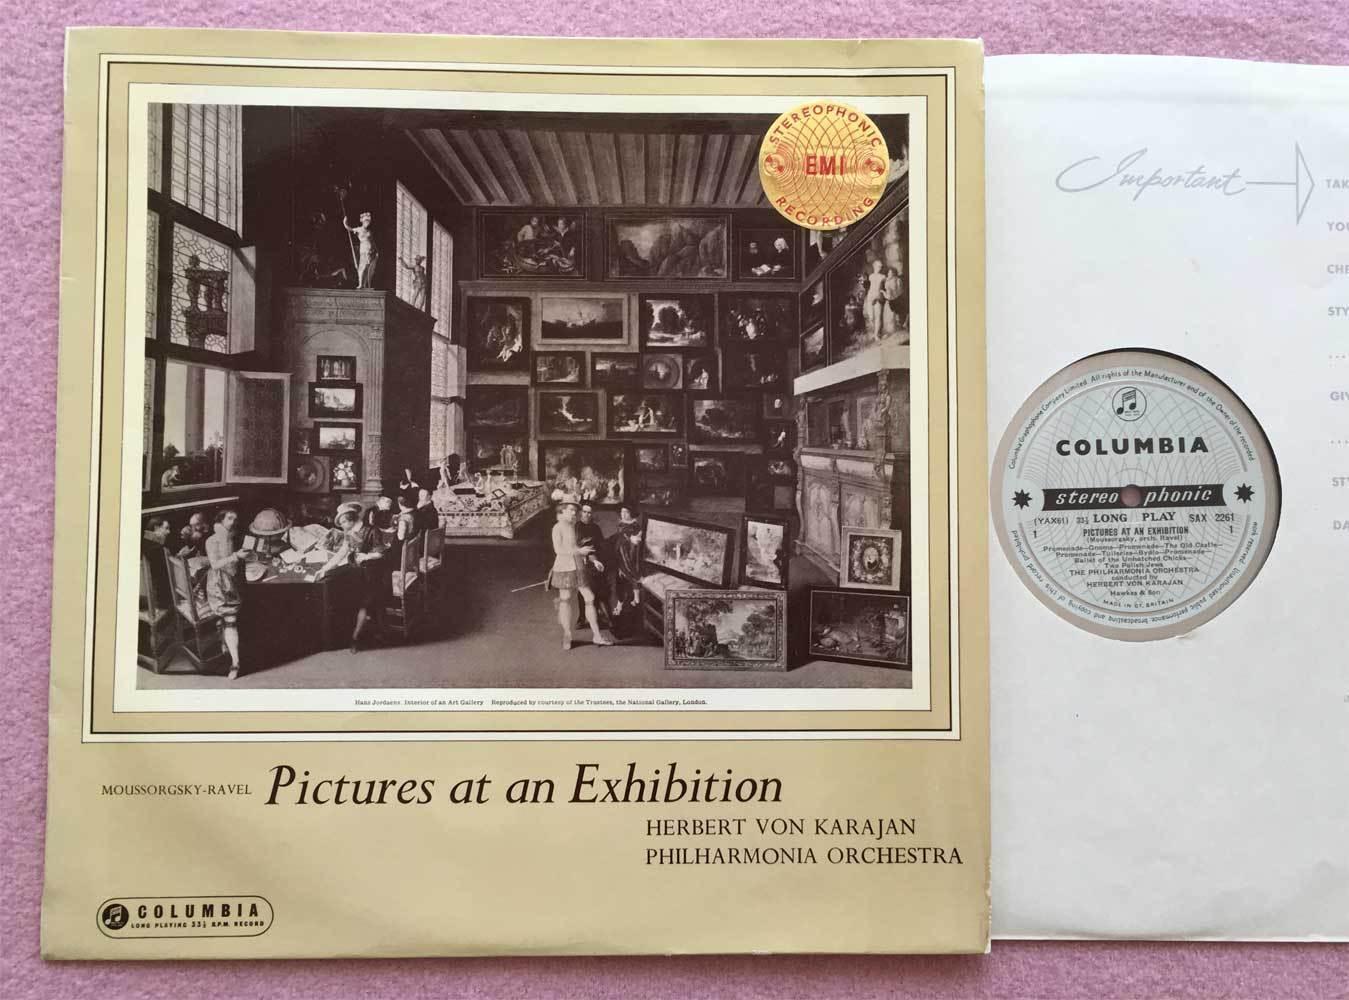 HERBERT von KARAJAN Pictures at an Exhibition ORIG Columbia SAX 2261 UK-1960 NM-